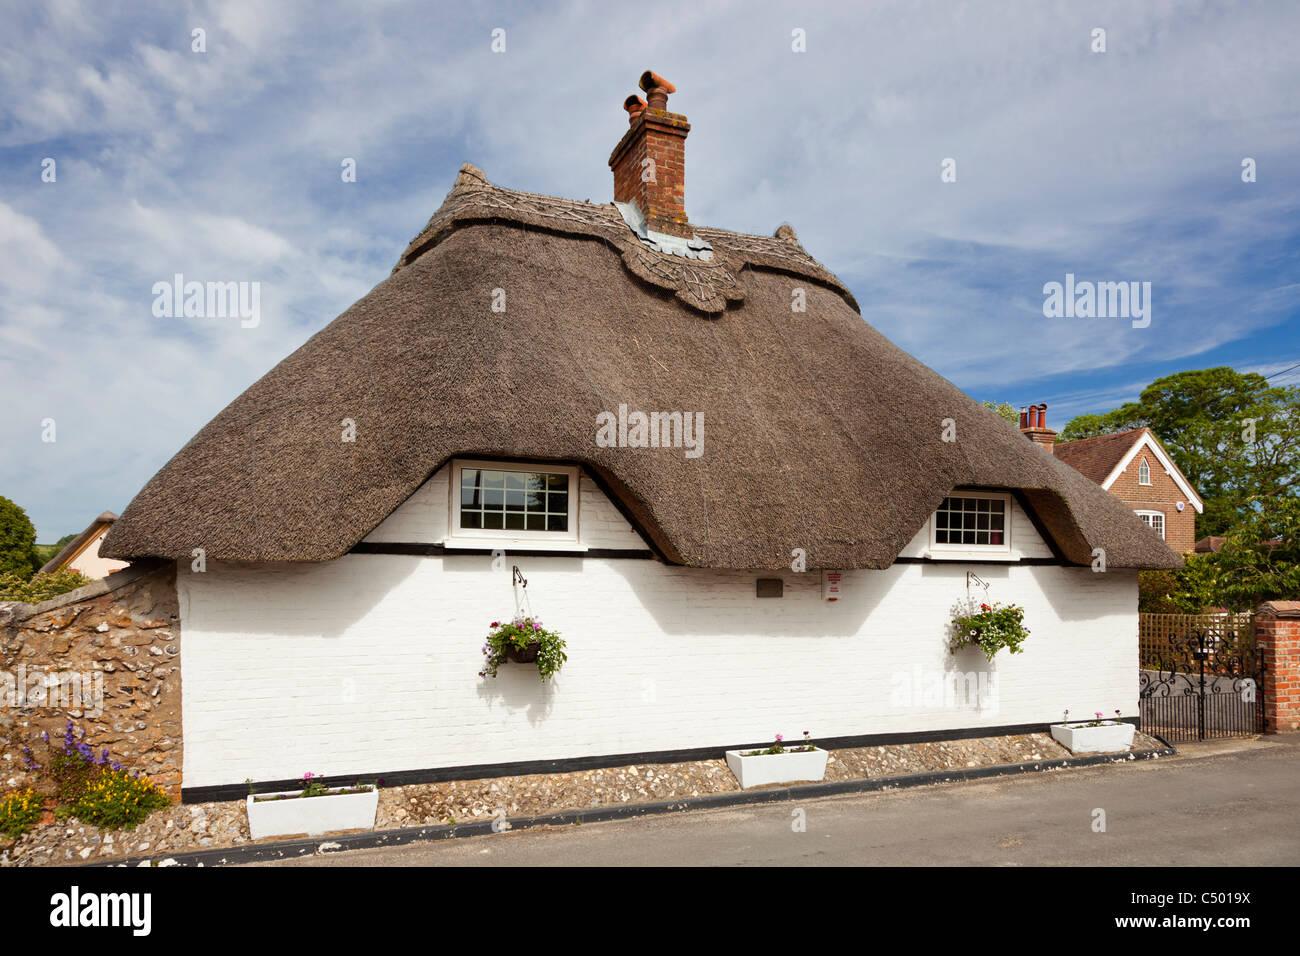 Thatched cottage bungalow, Tarrant Monkton, Dorset, England, UK - Stock Image